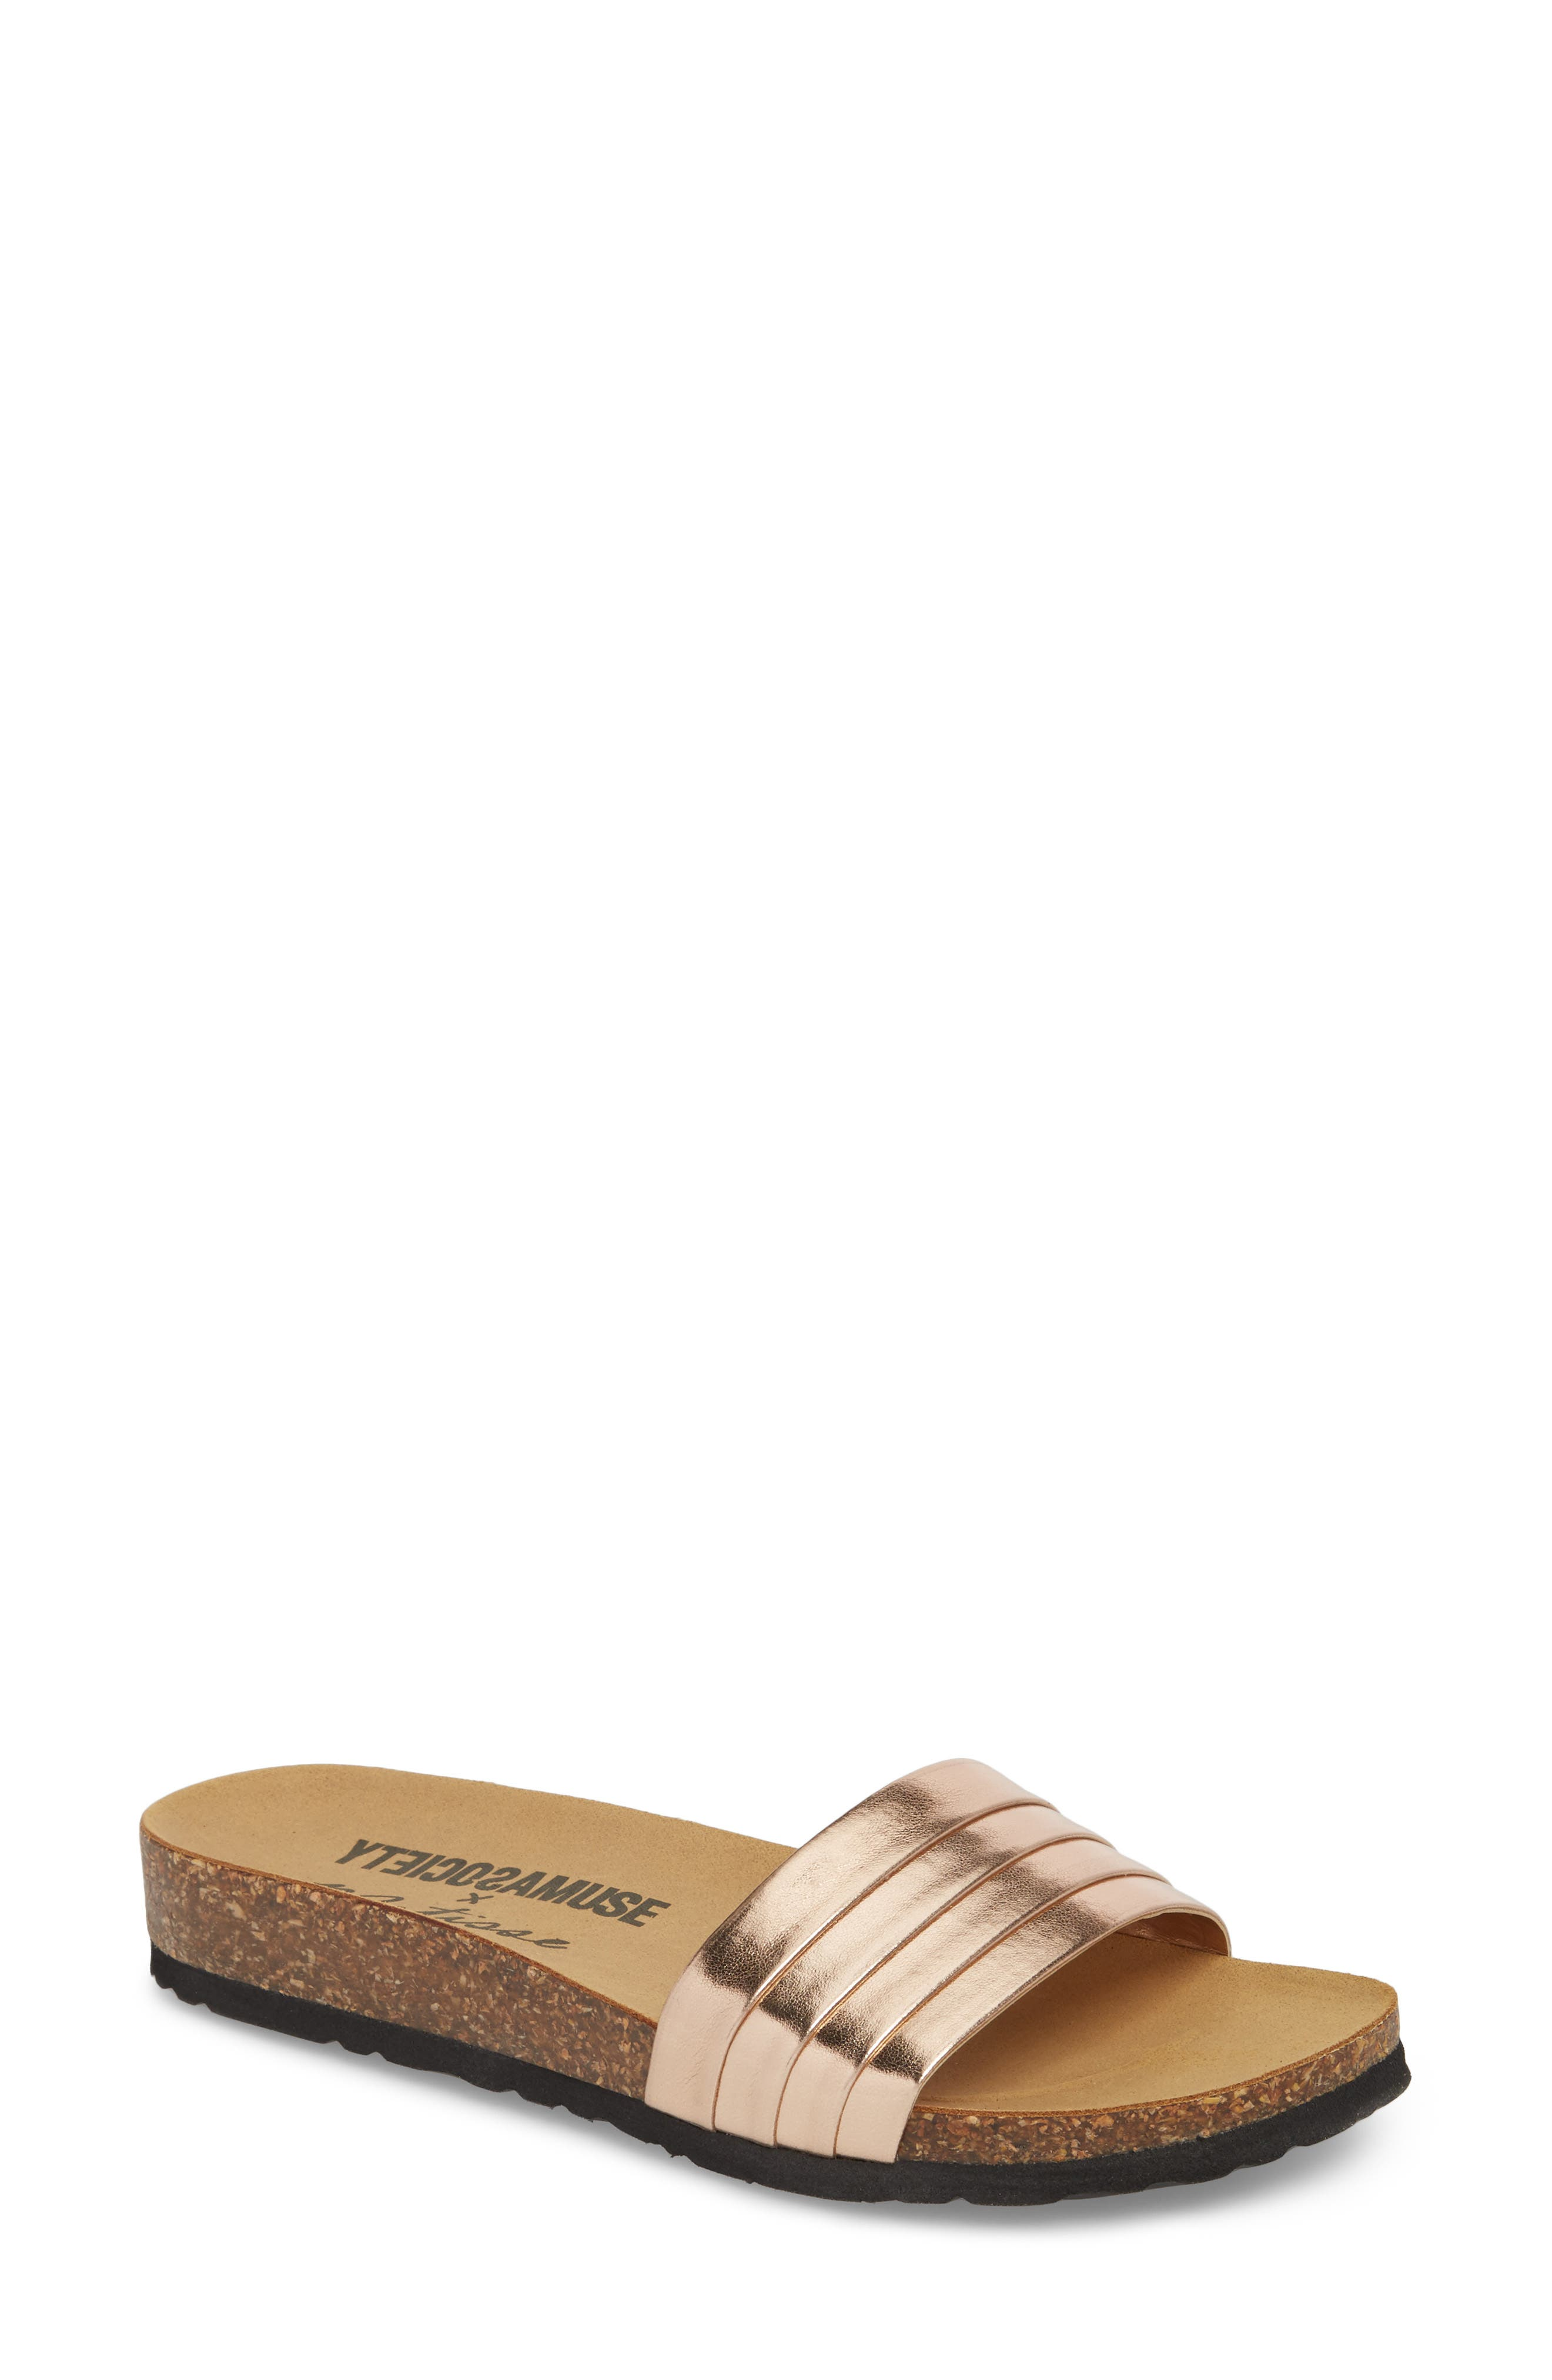 Santos Slide Sandal,                         Main,                         color, Rose Gold Faux Leather